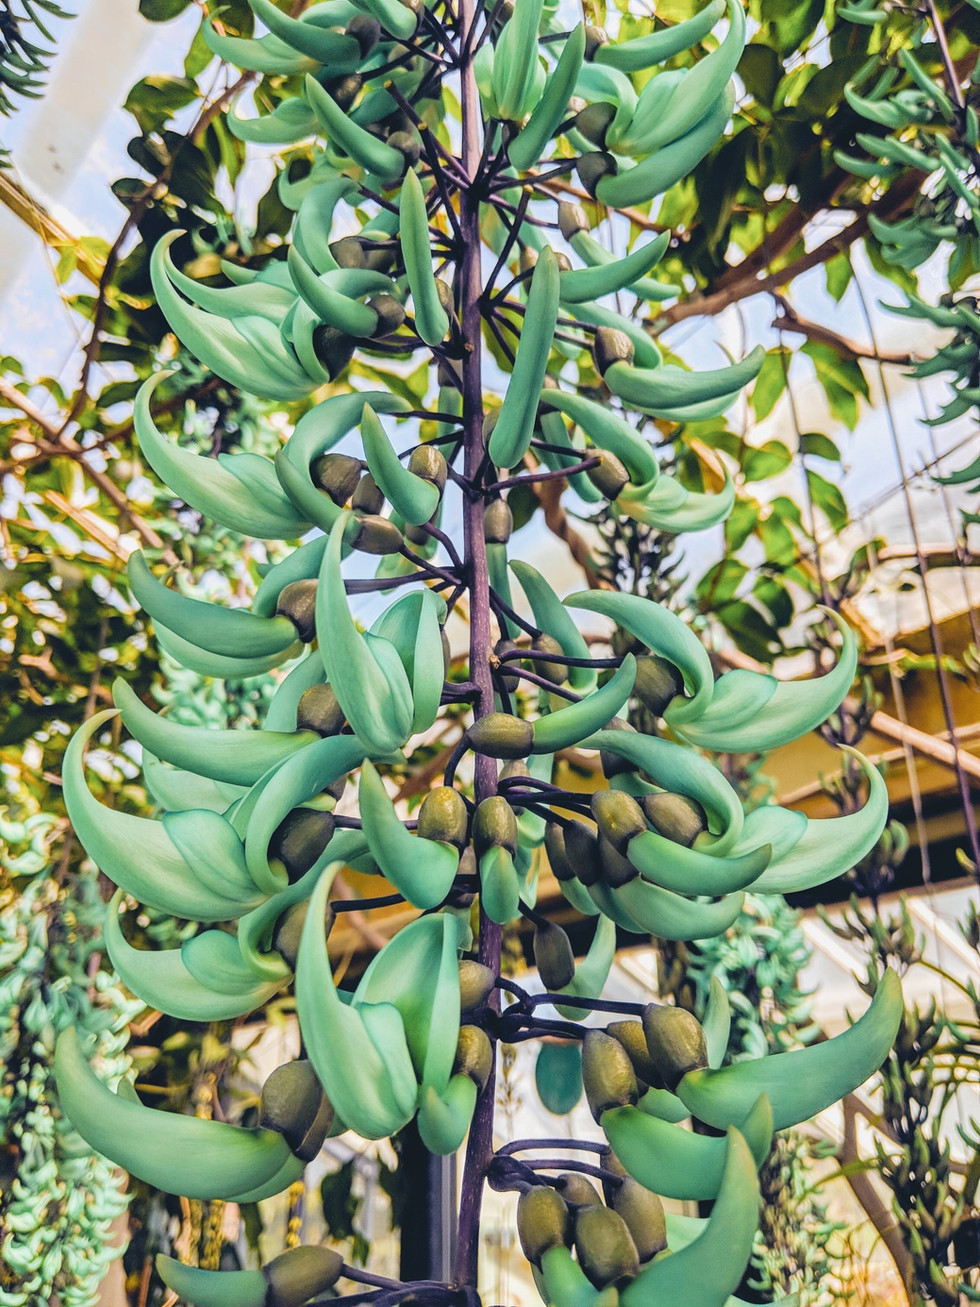 The Fake Plastic Jade Vine